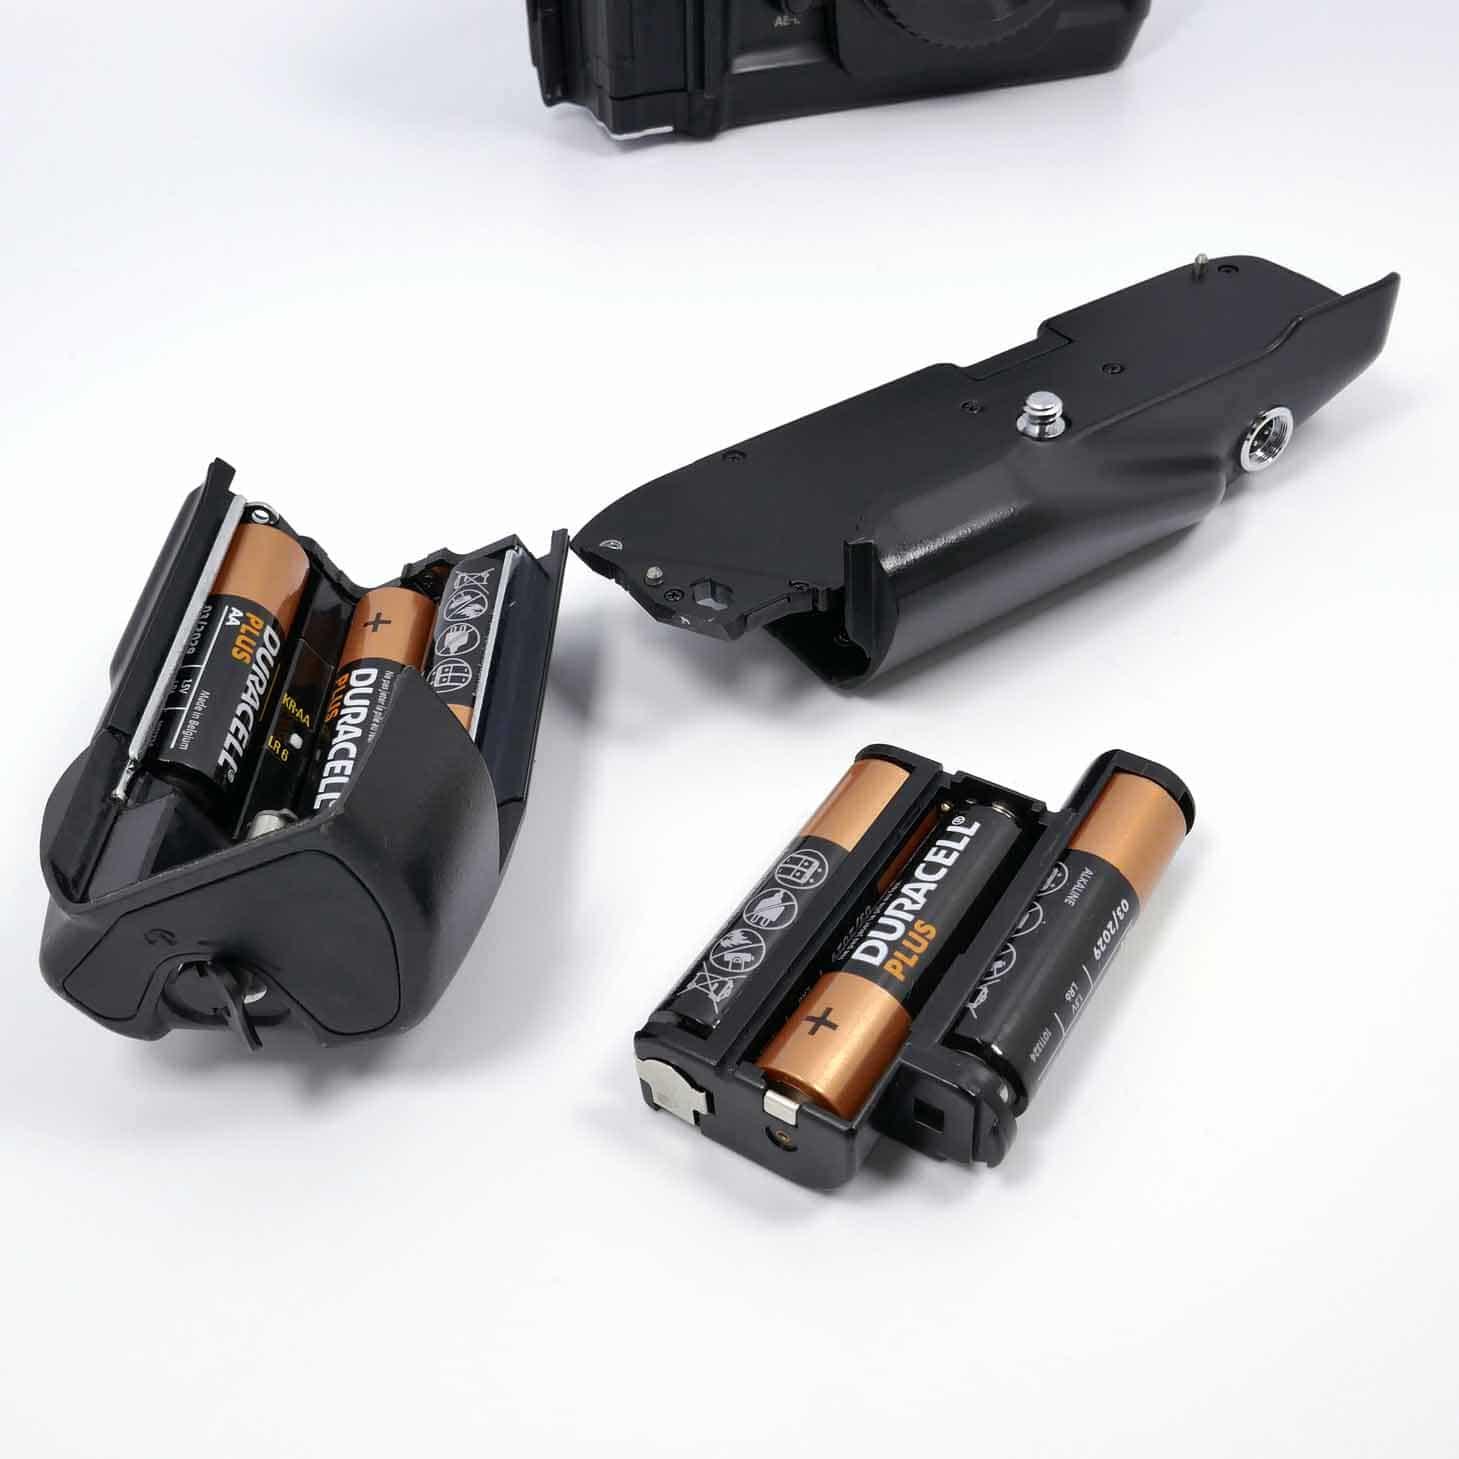 clean-cameras-Nikon-F4-+Nikon--MB-21-05